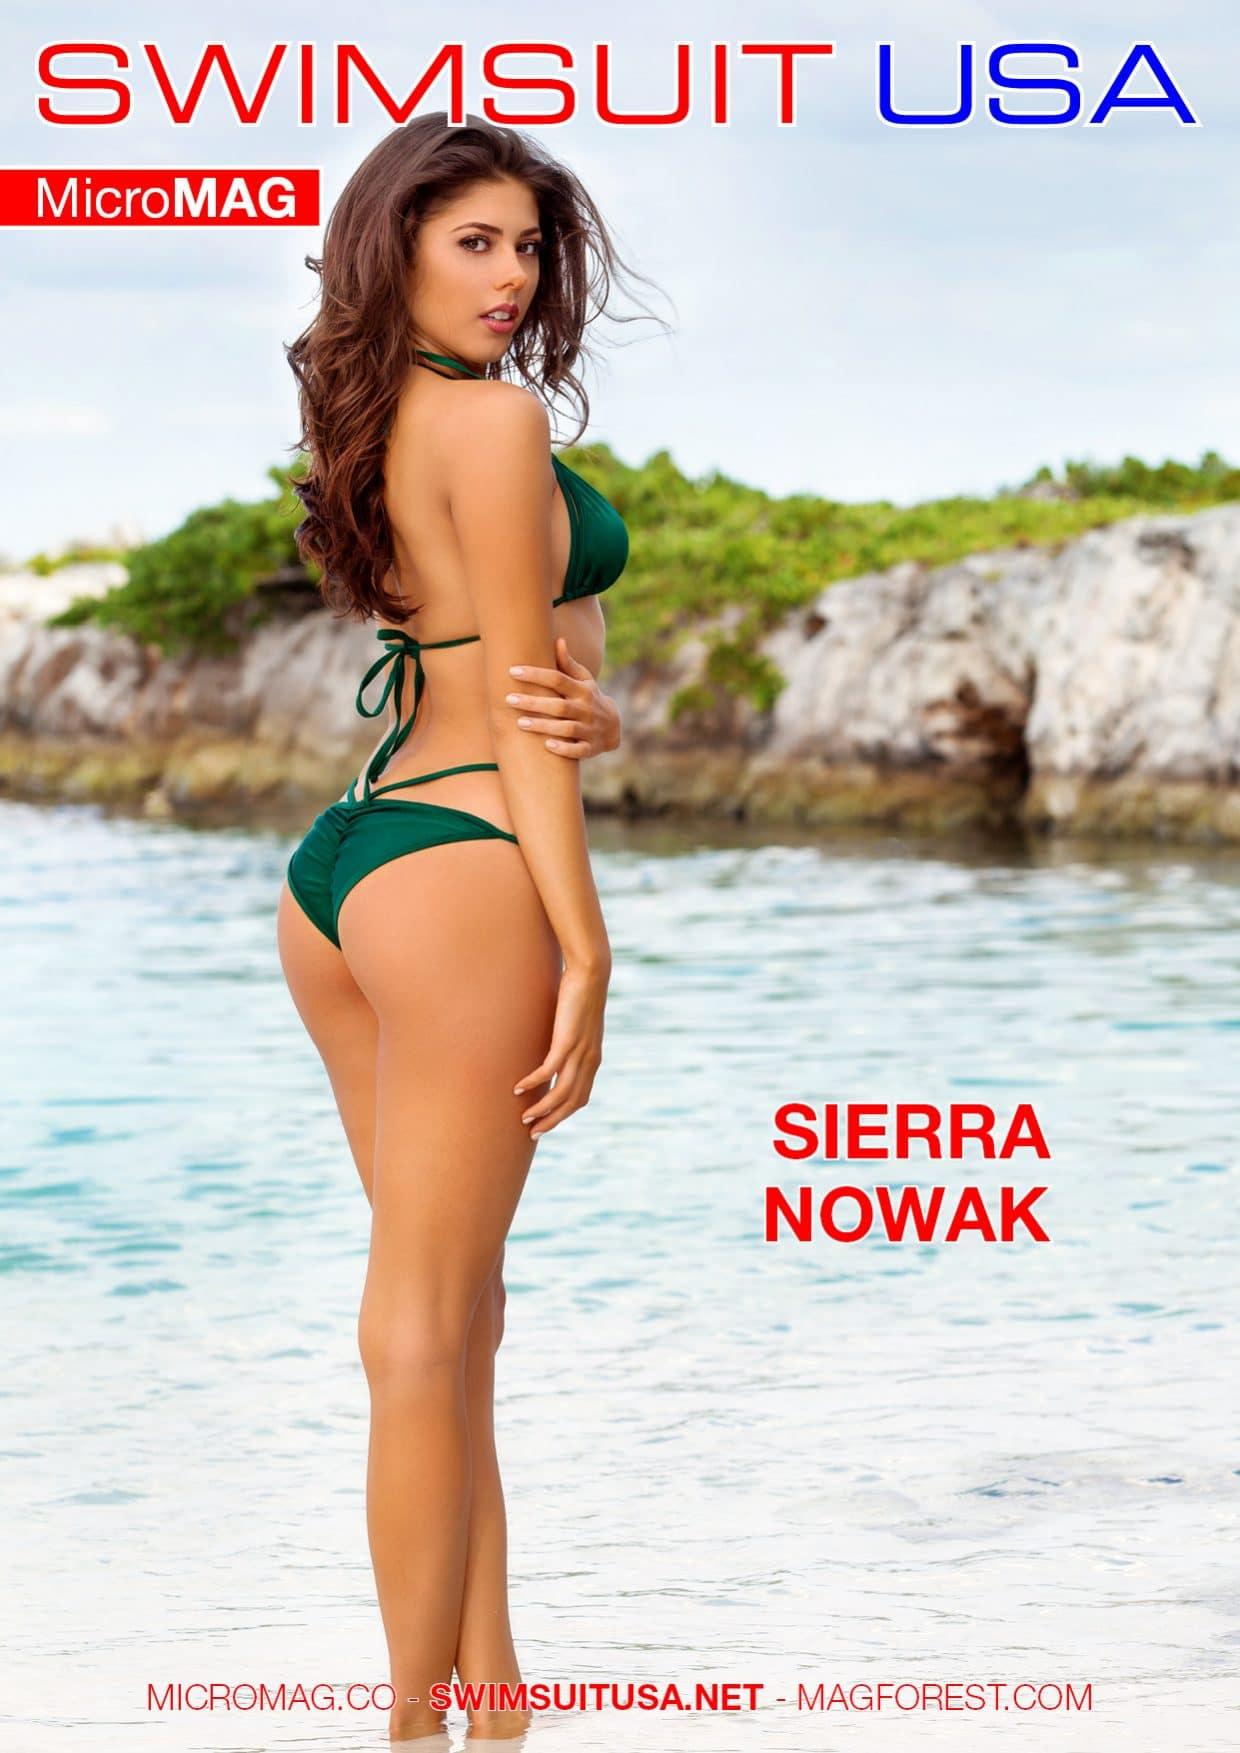 Swimsuit USA MicroMAG - Sierra Nowak 1